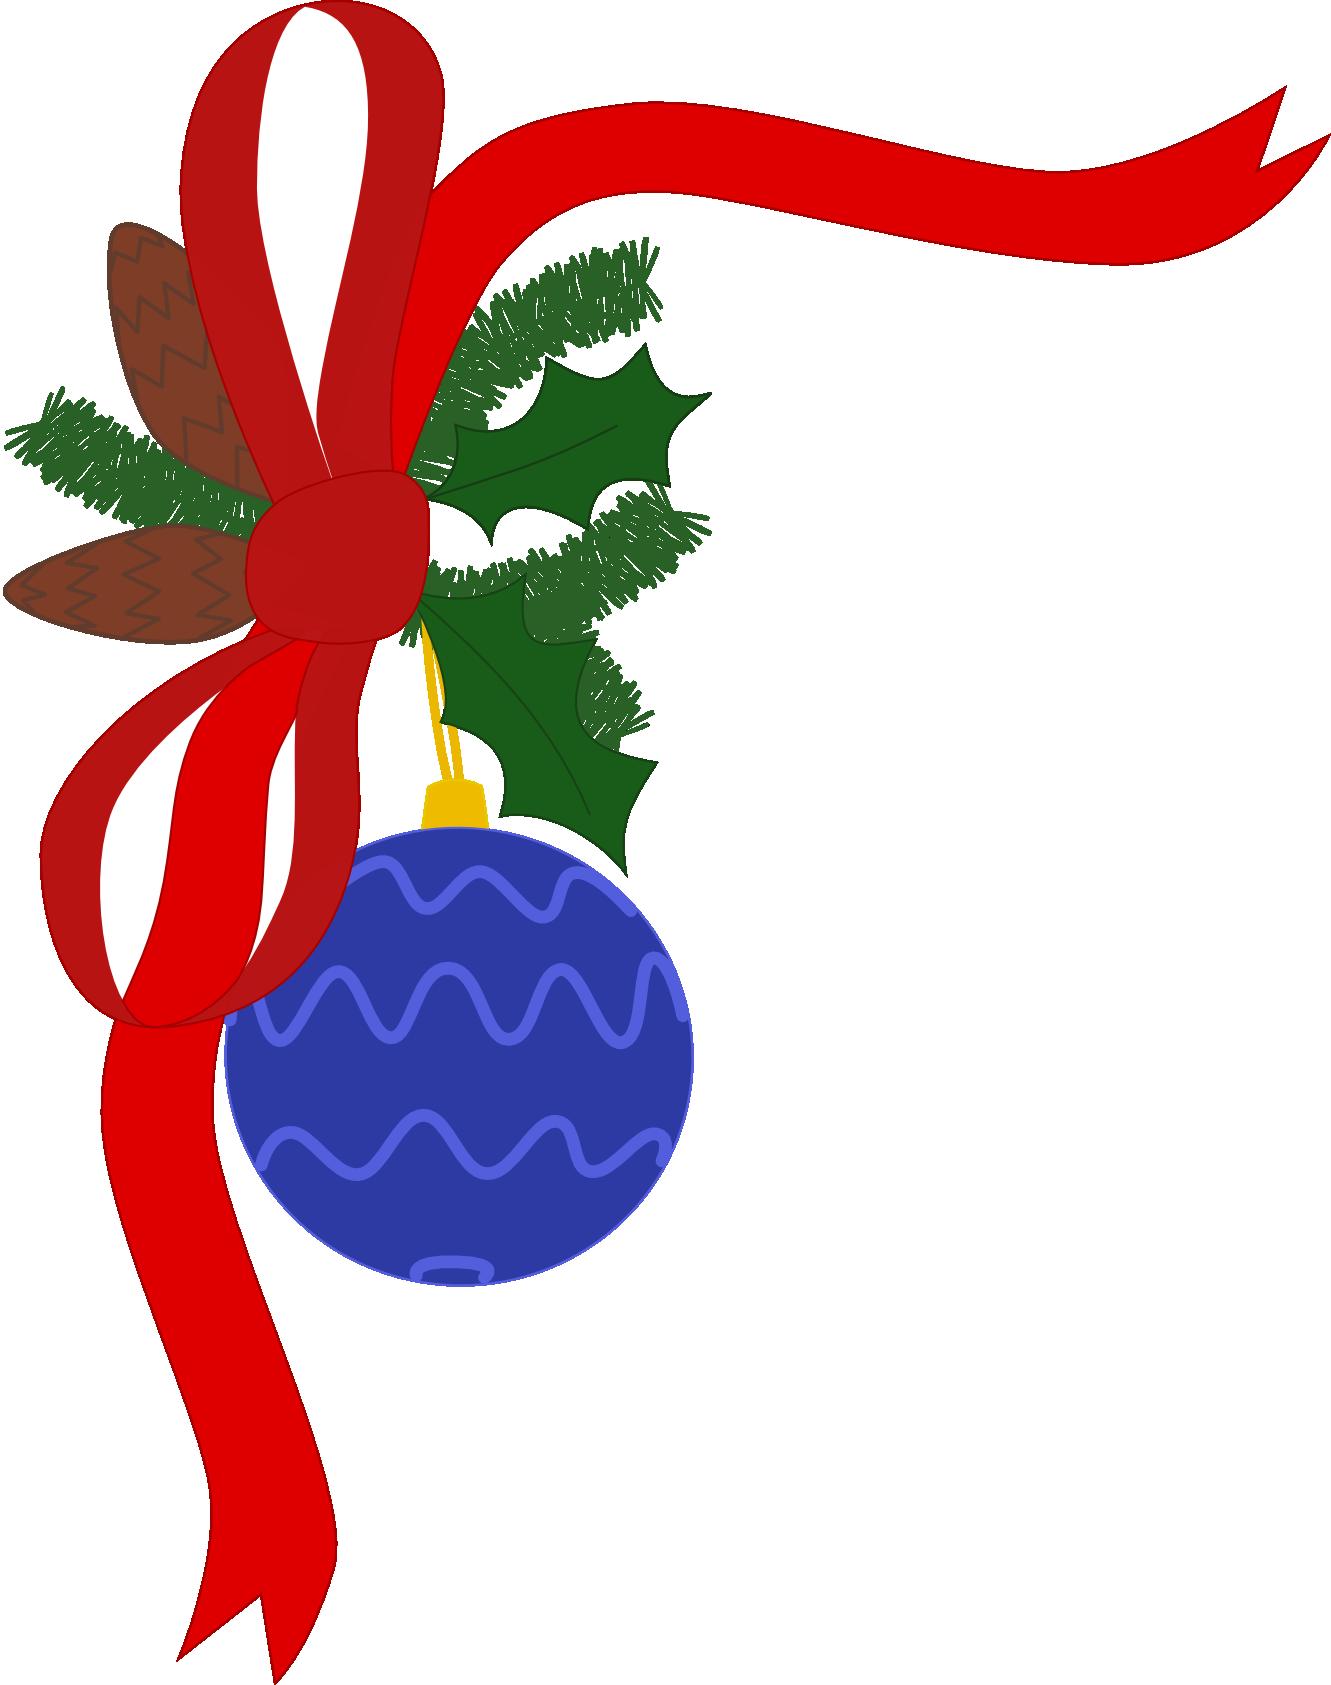 1331x1685 Christmas Ornament Clip Art